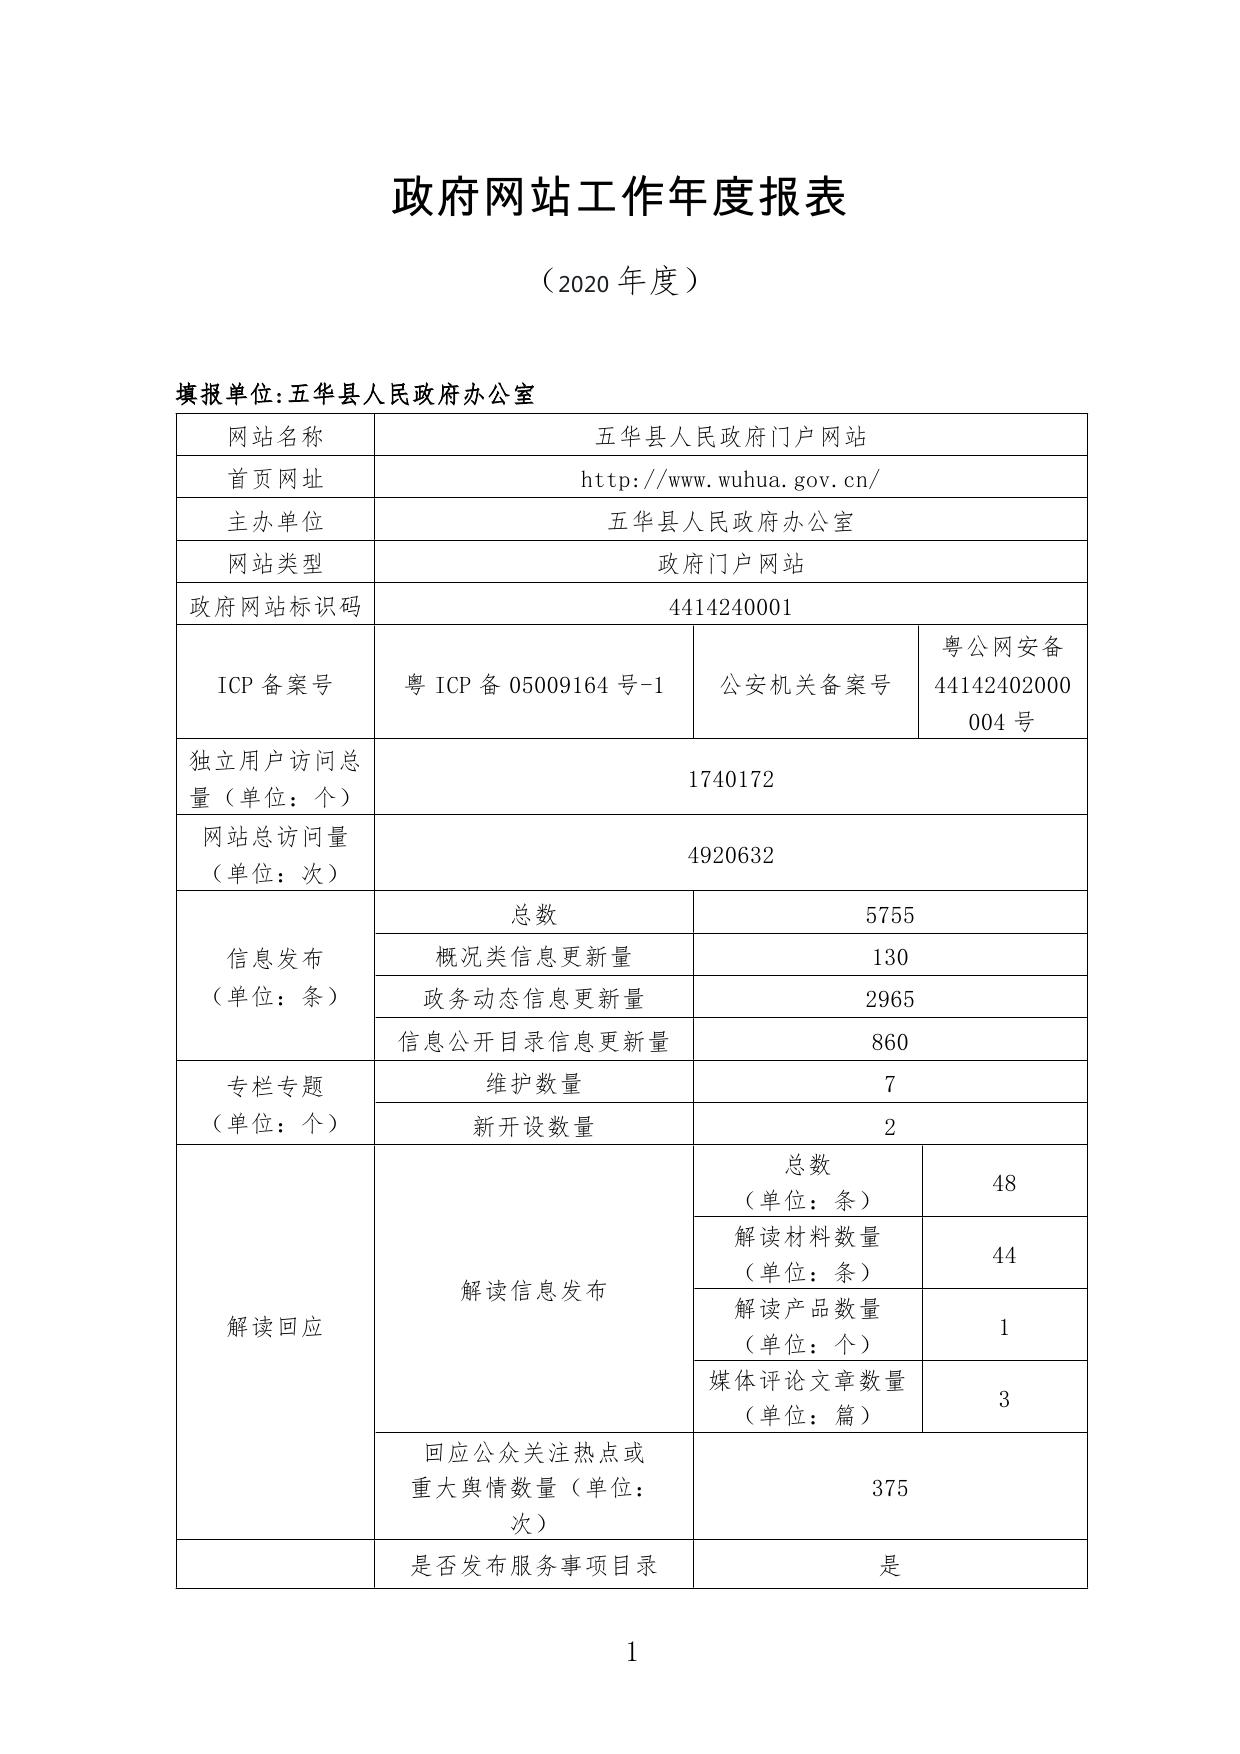 report_tb_4414240001 (1)0000.jpg